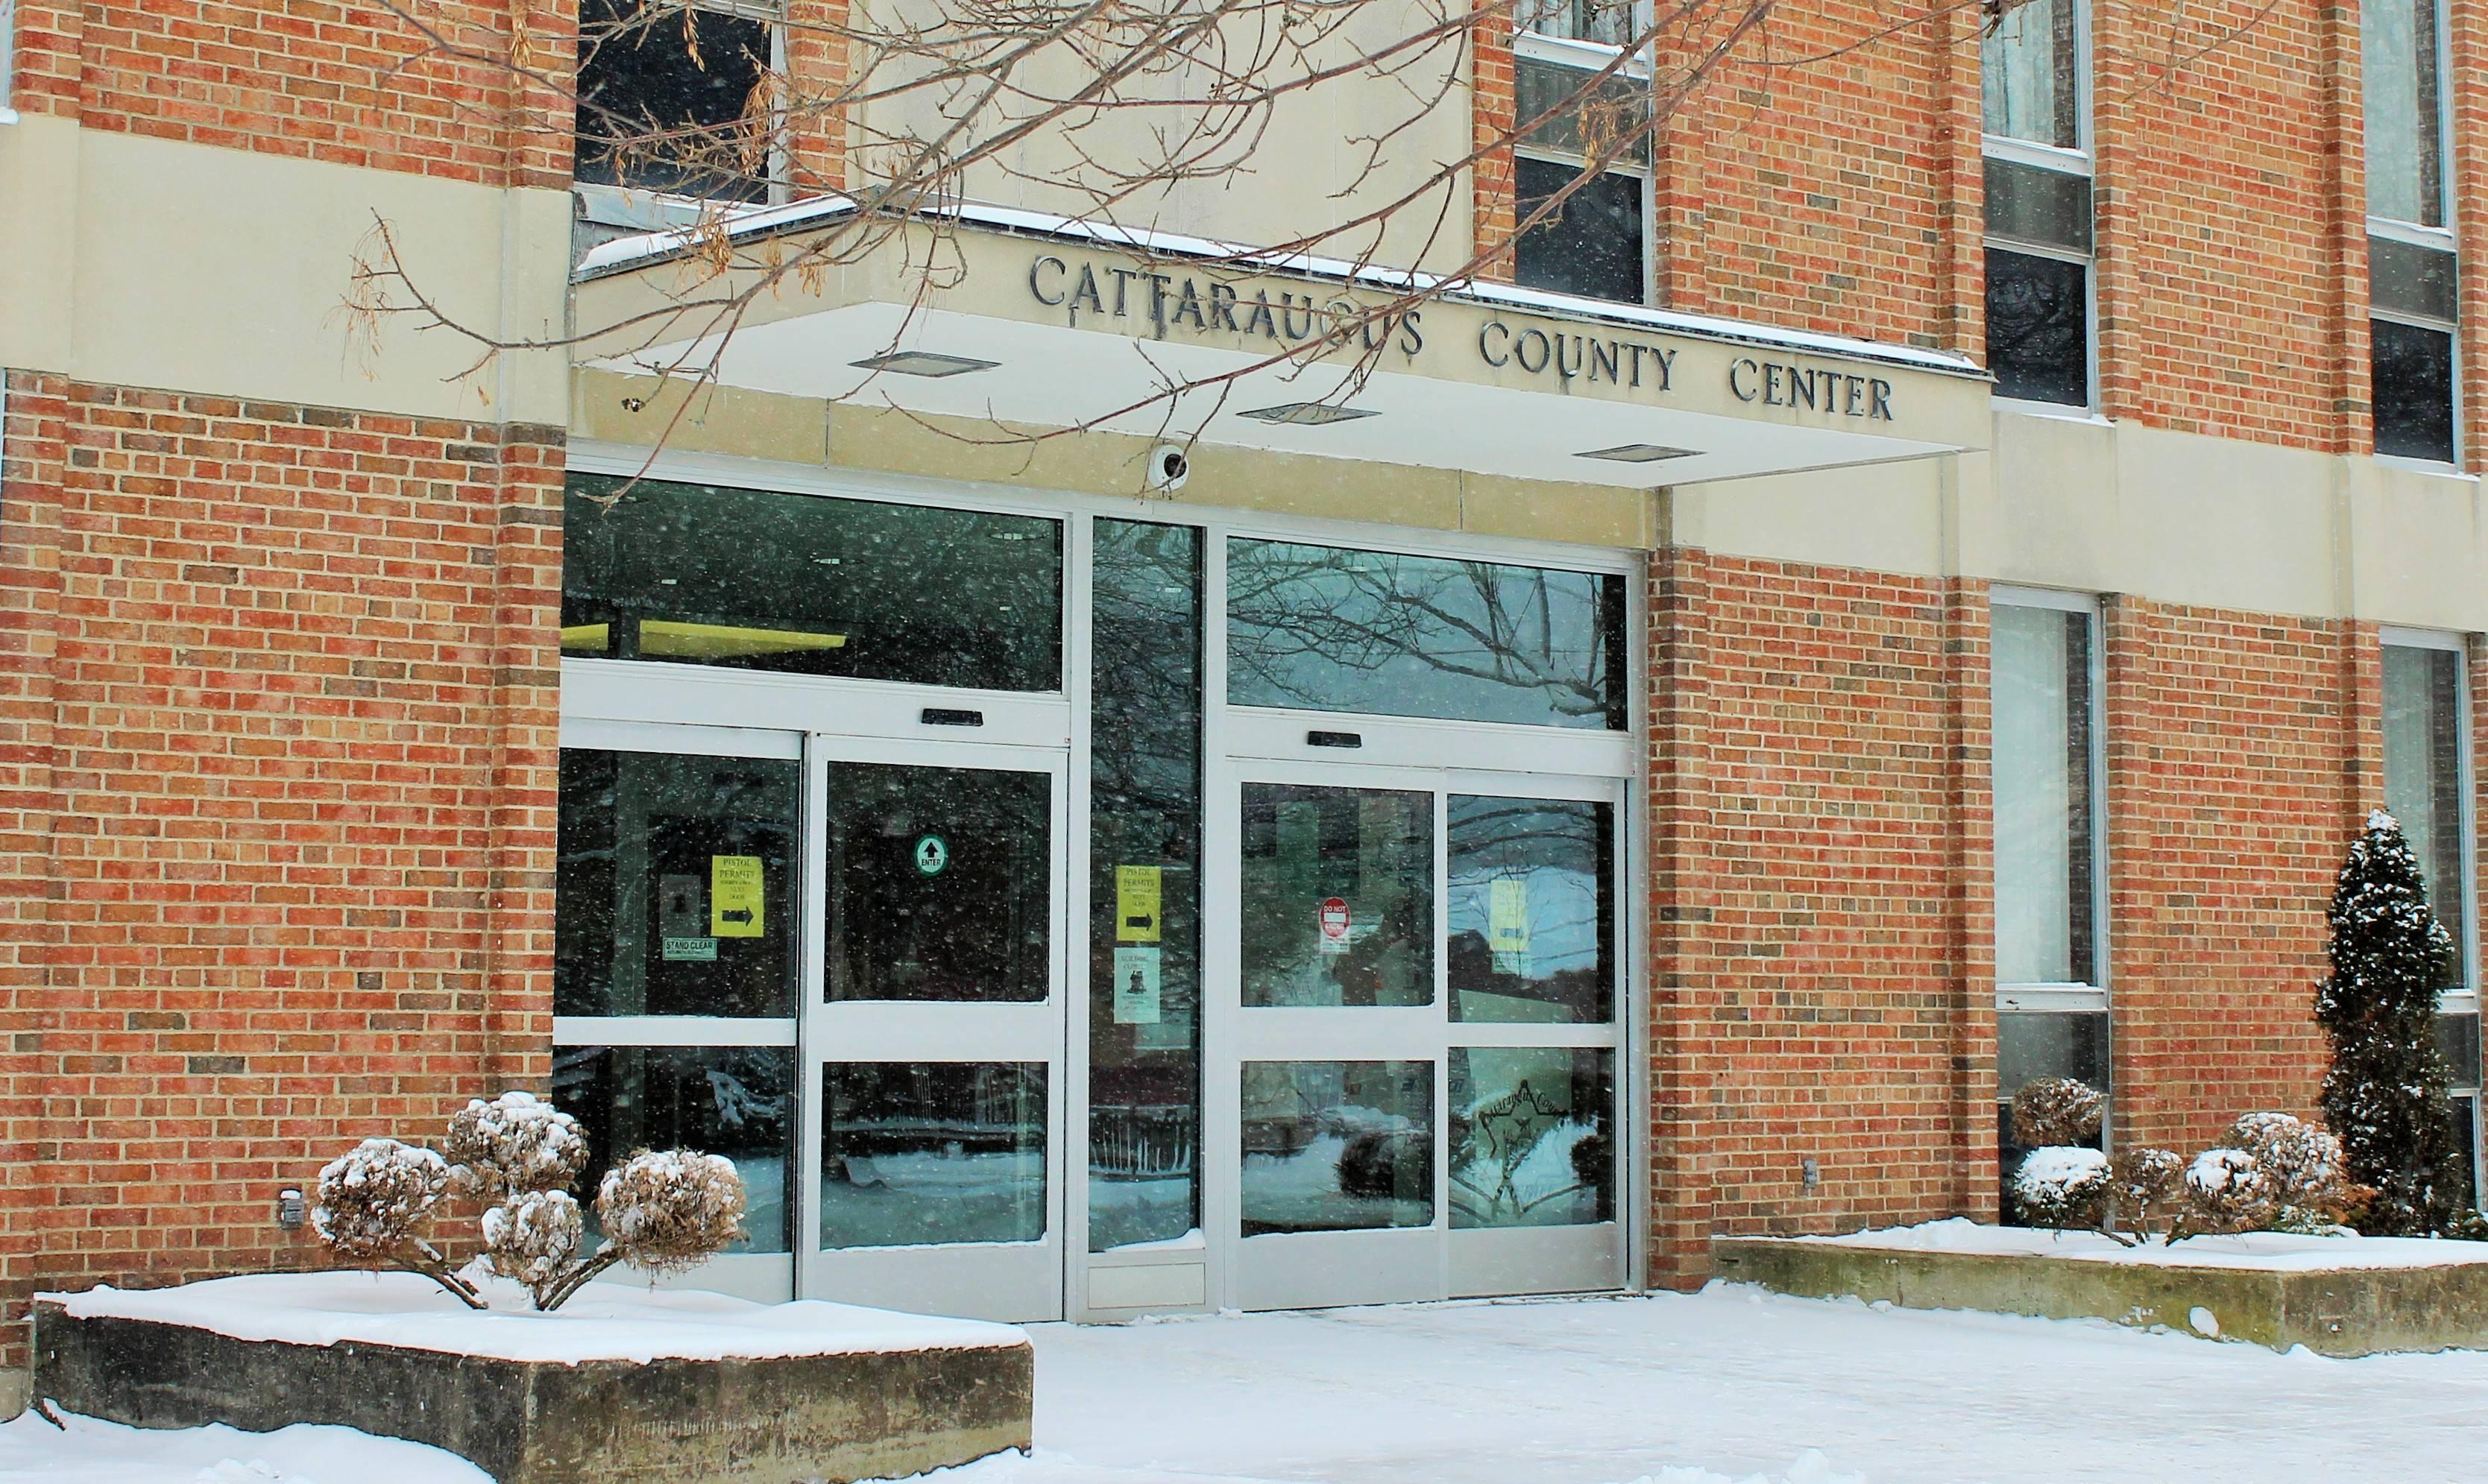 a9fe96d703866f14fe93_cattaraugus_county_center.JPG